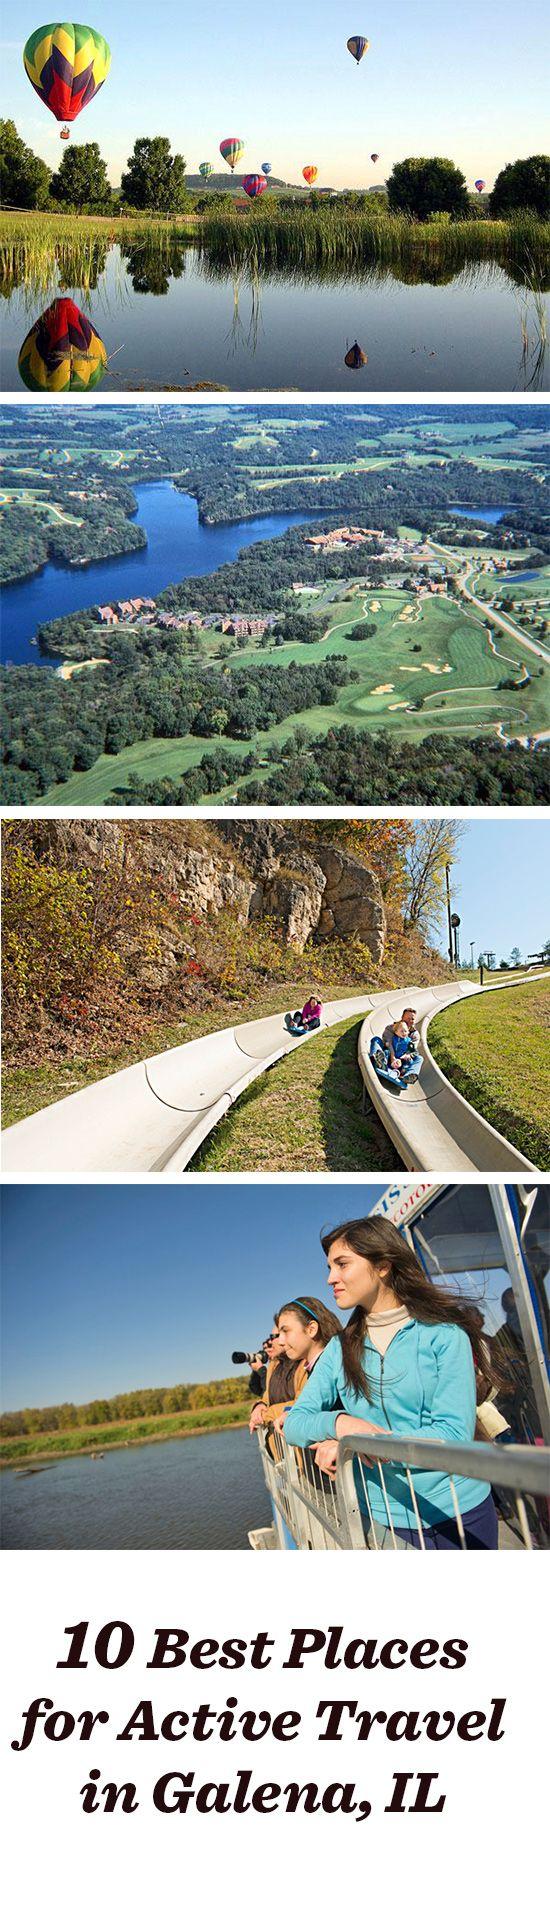 Hotair ballooning, golf, water sports, river rides Just